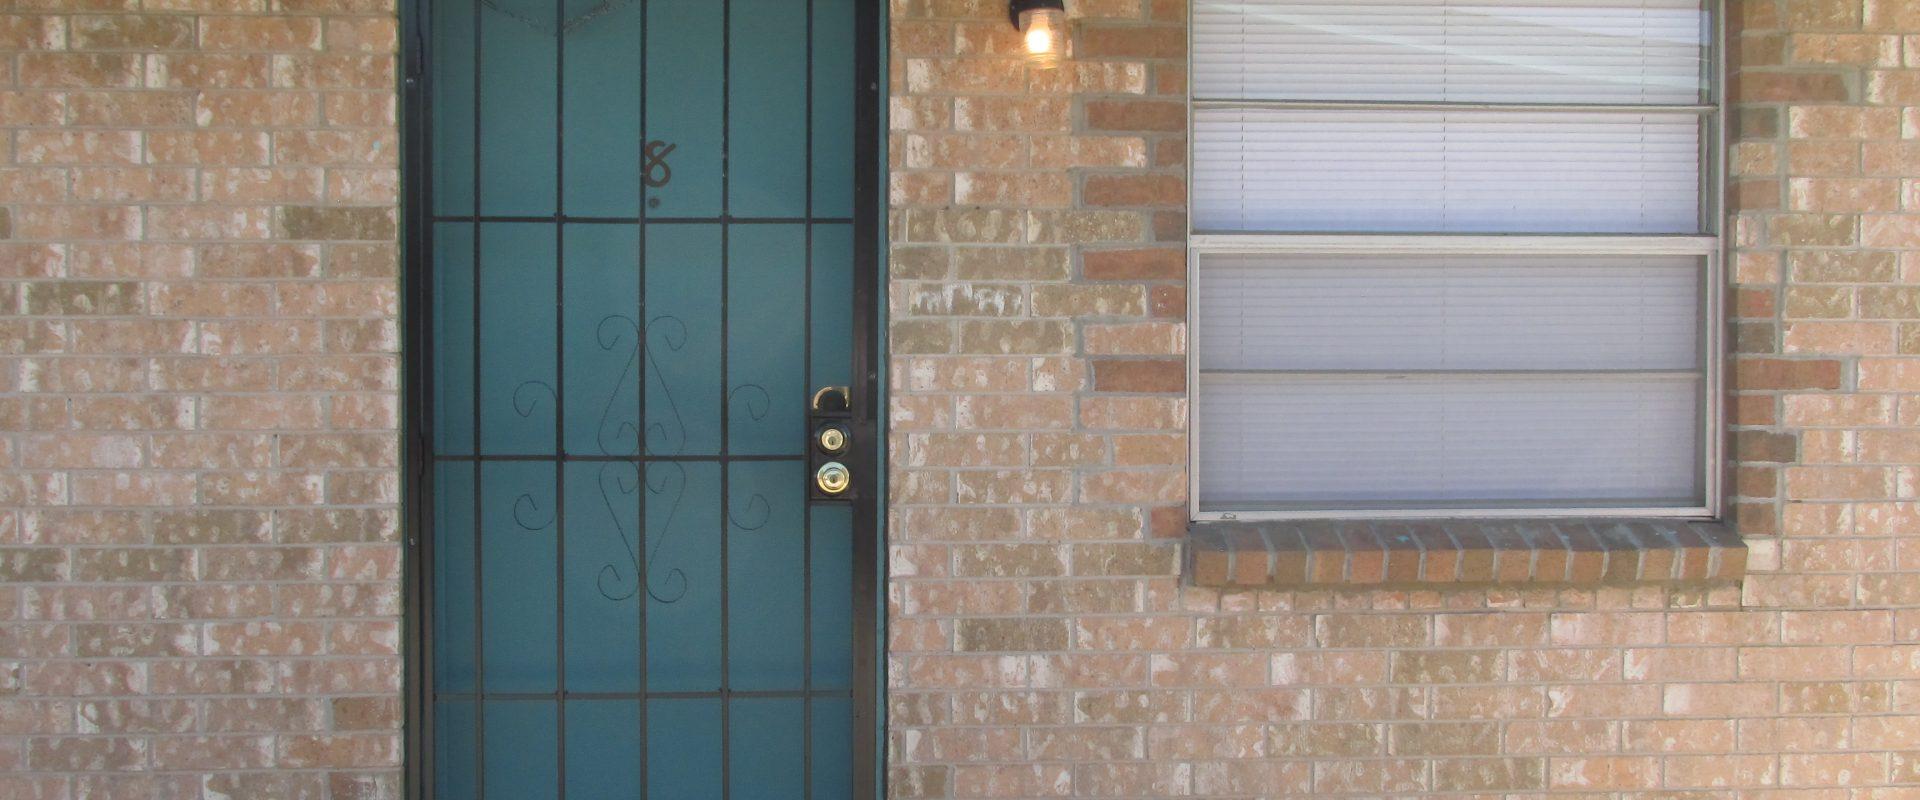 1410 S. Espina Street #3, #5, #8, Las Cruces, New Mexico  88001